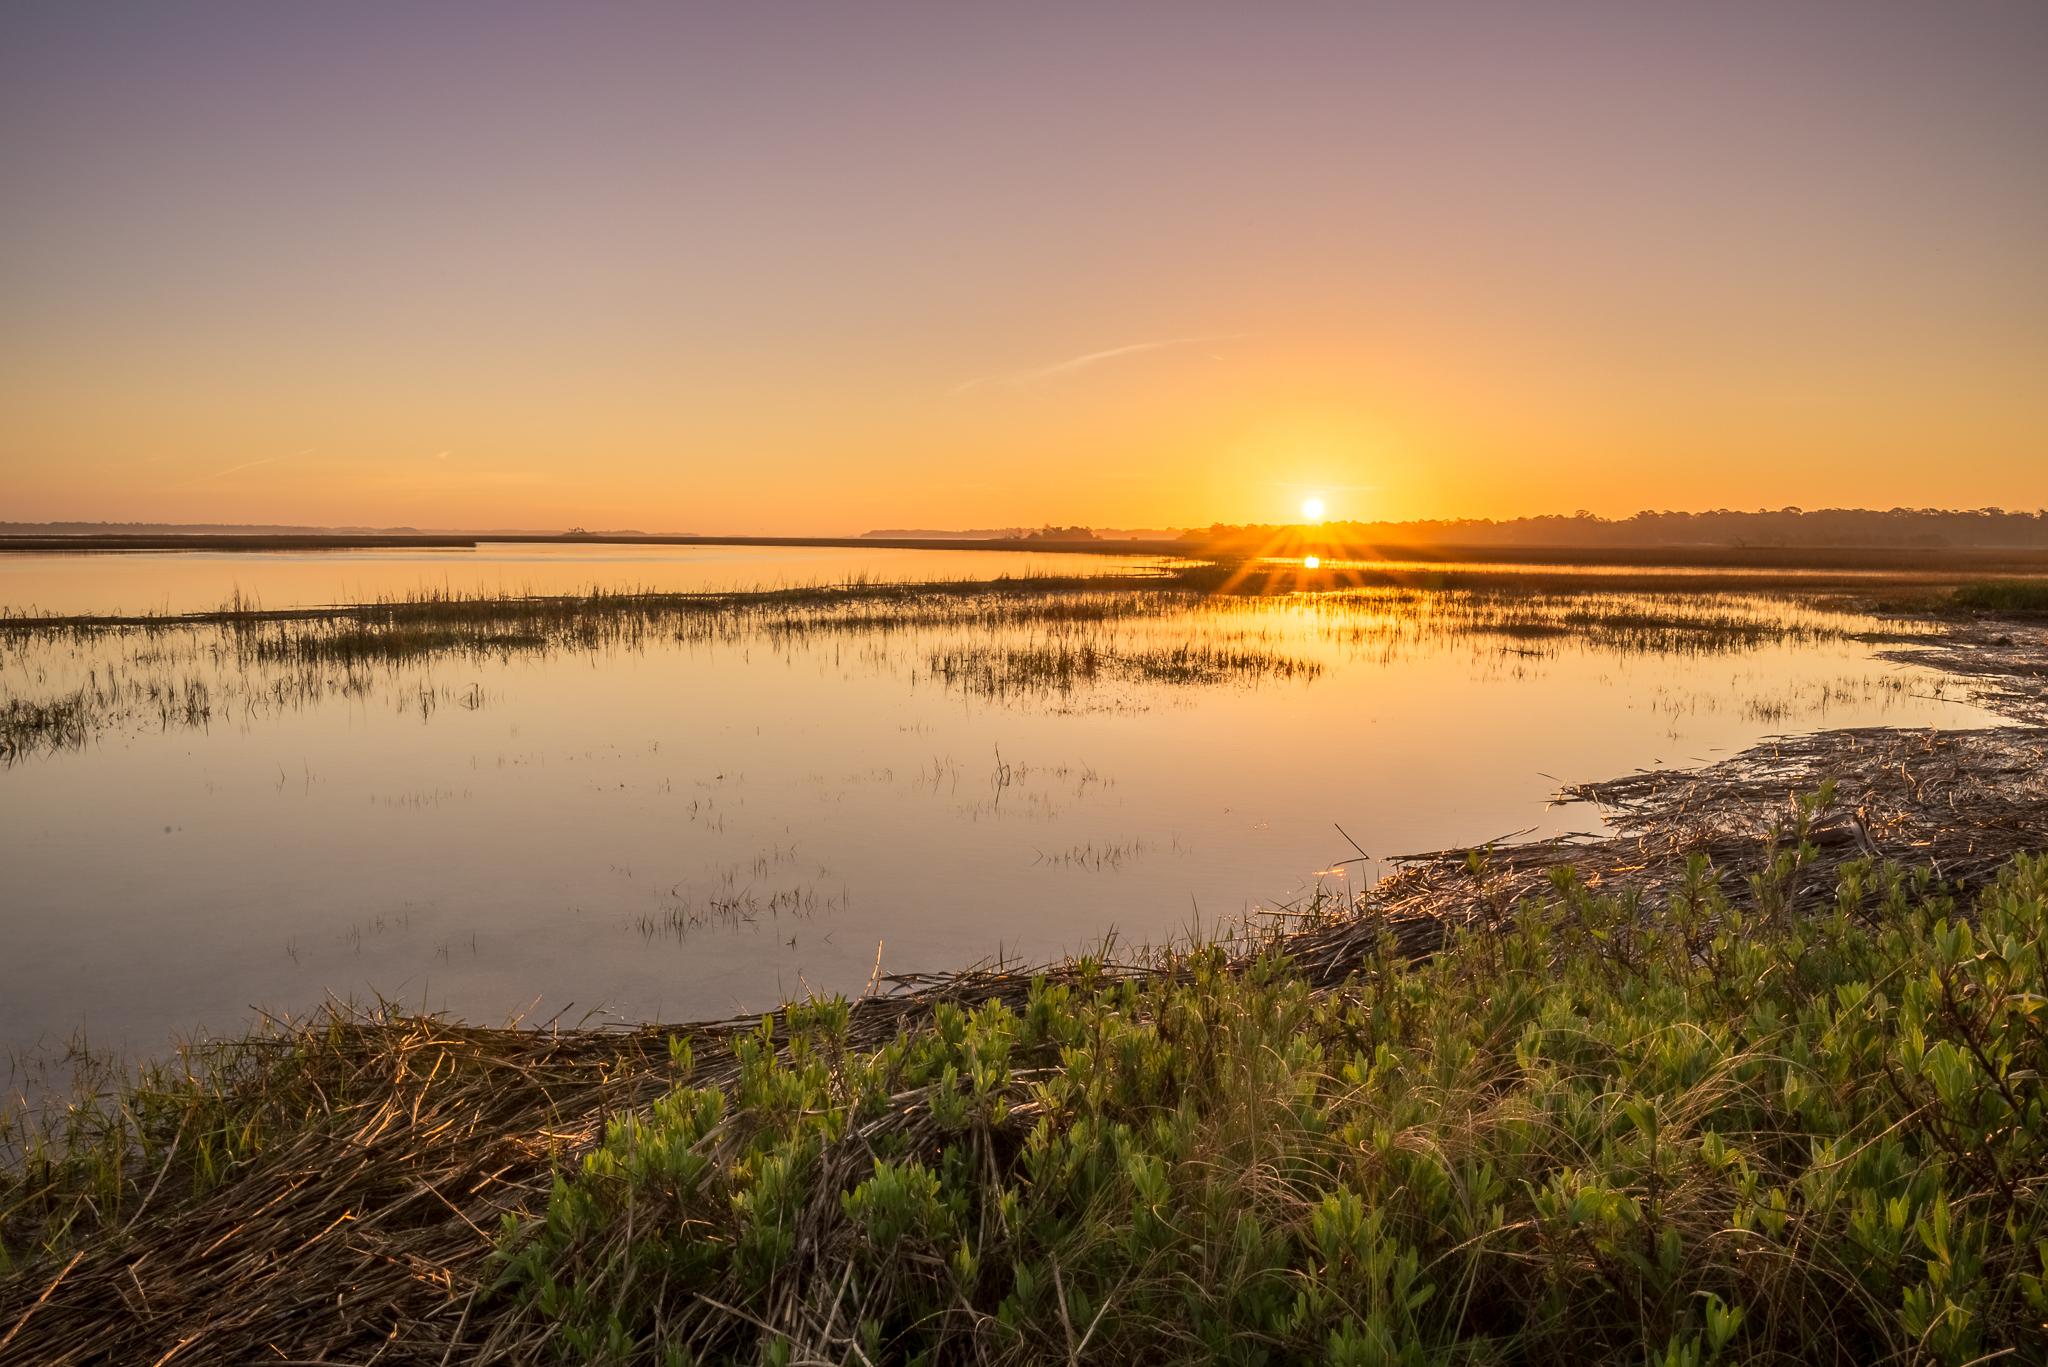 landscape-of-marsh-at-sunrise